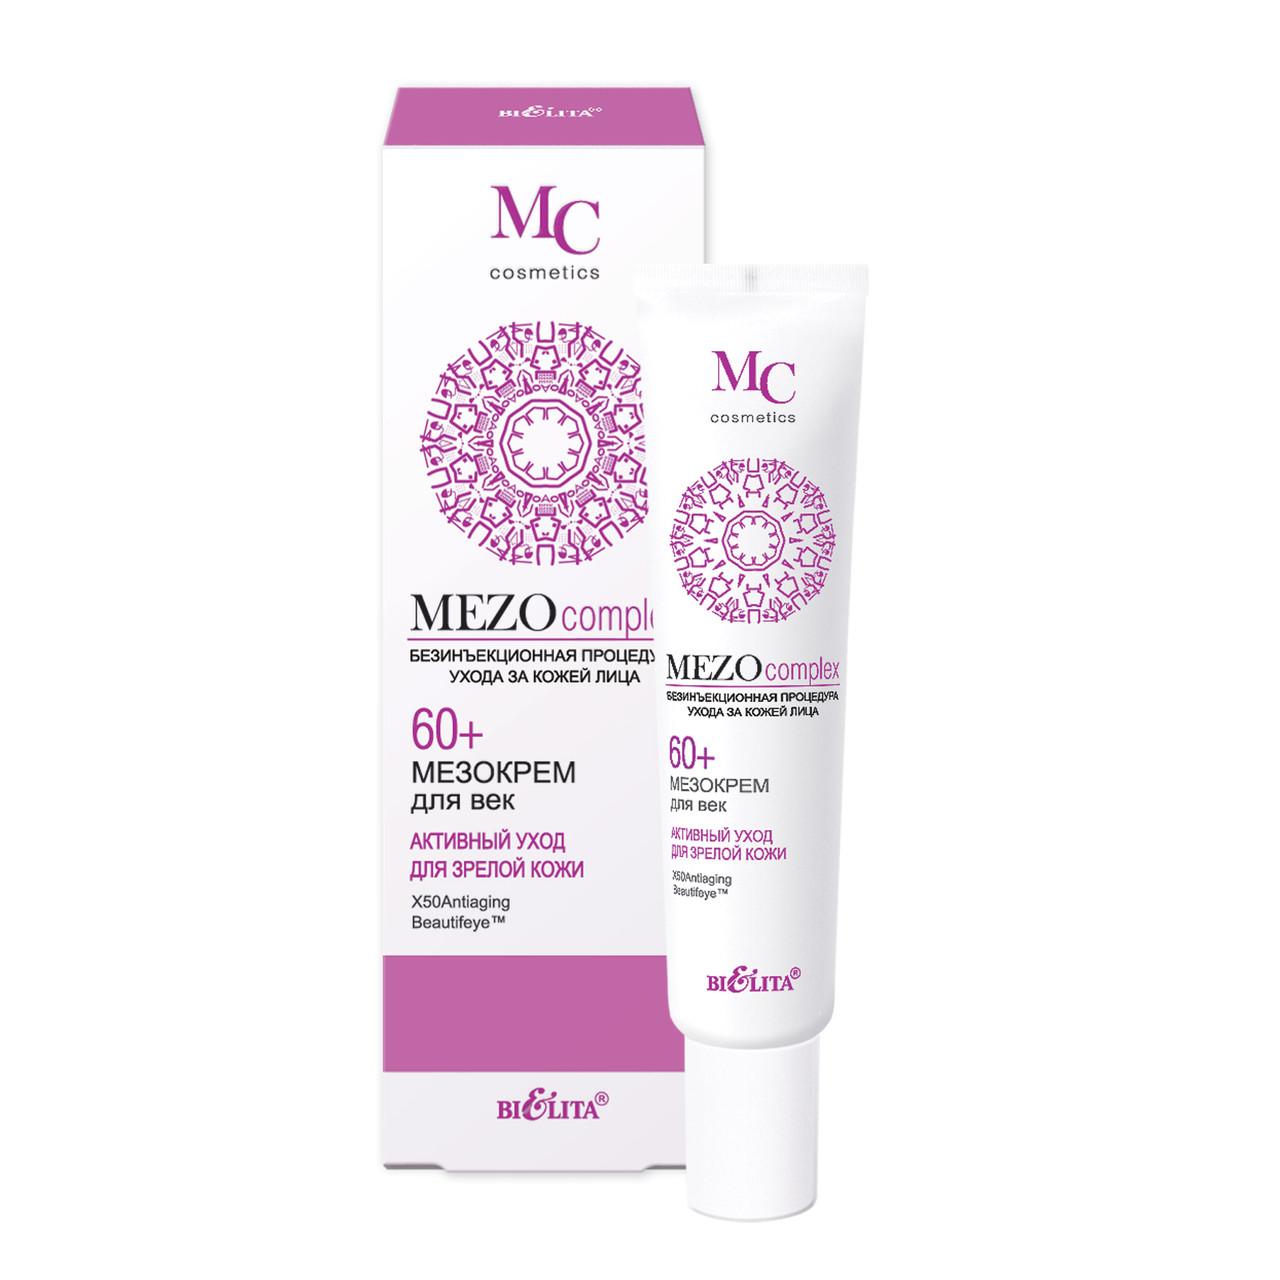 "Мезокрем для век ""Активный уход для зрелой кожи"" Bielita MEZO Complex 60+"